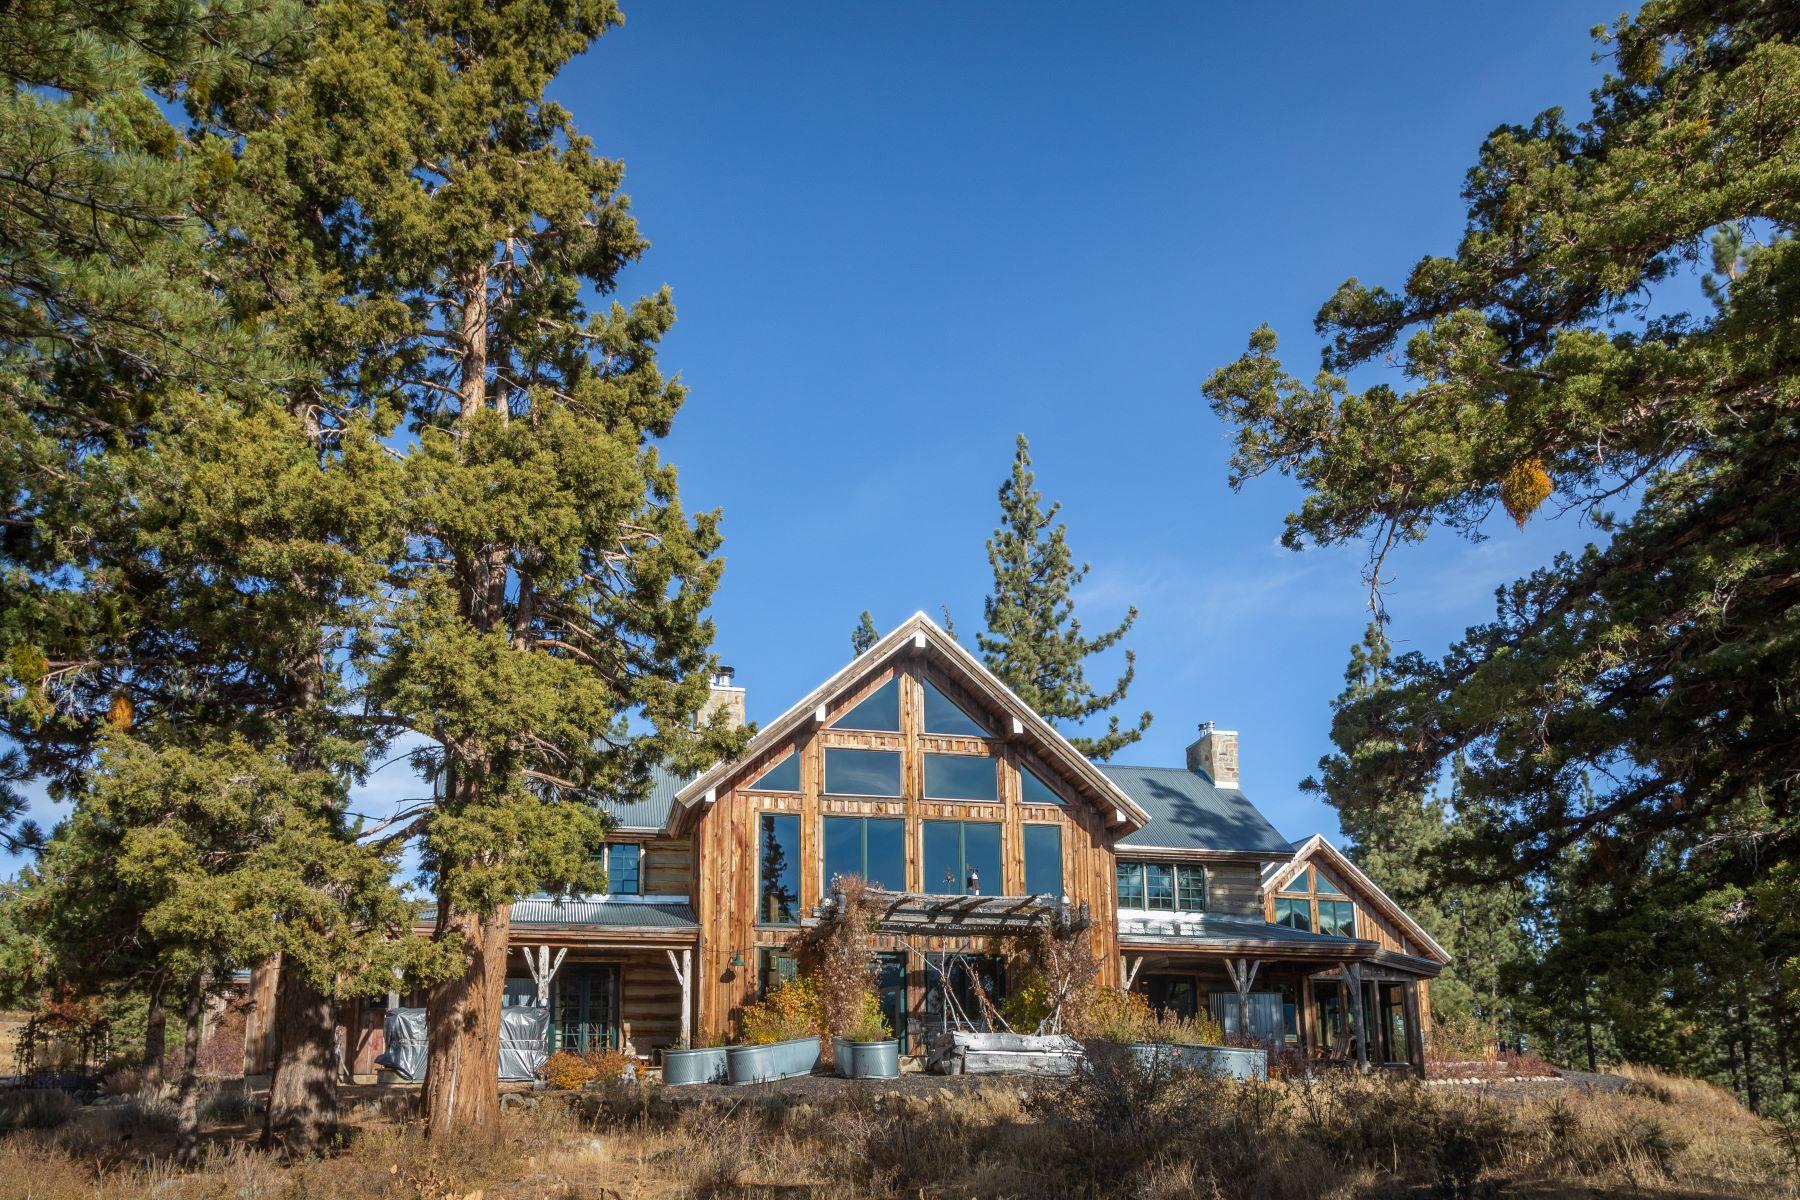 Additional photo for property listing at 19214 La Mirada Rd., Truckee, CA 96161 19214 La Mirada Rd. Truckee, California 96161 Estados Unidos